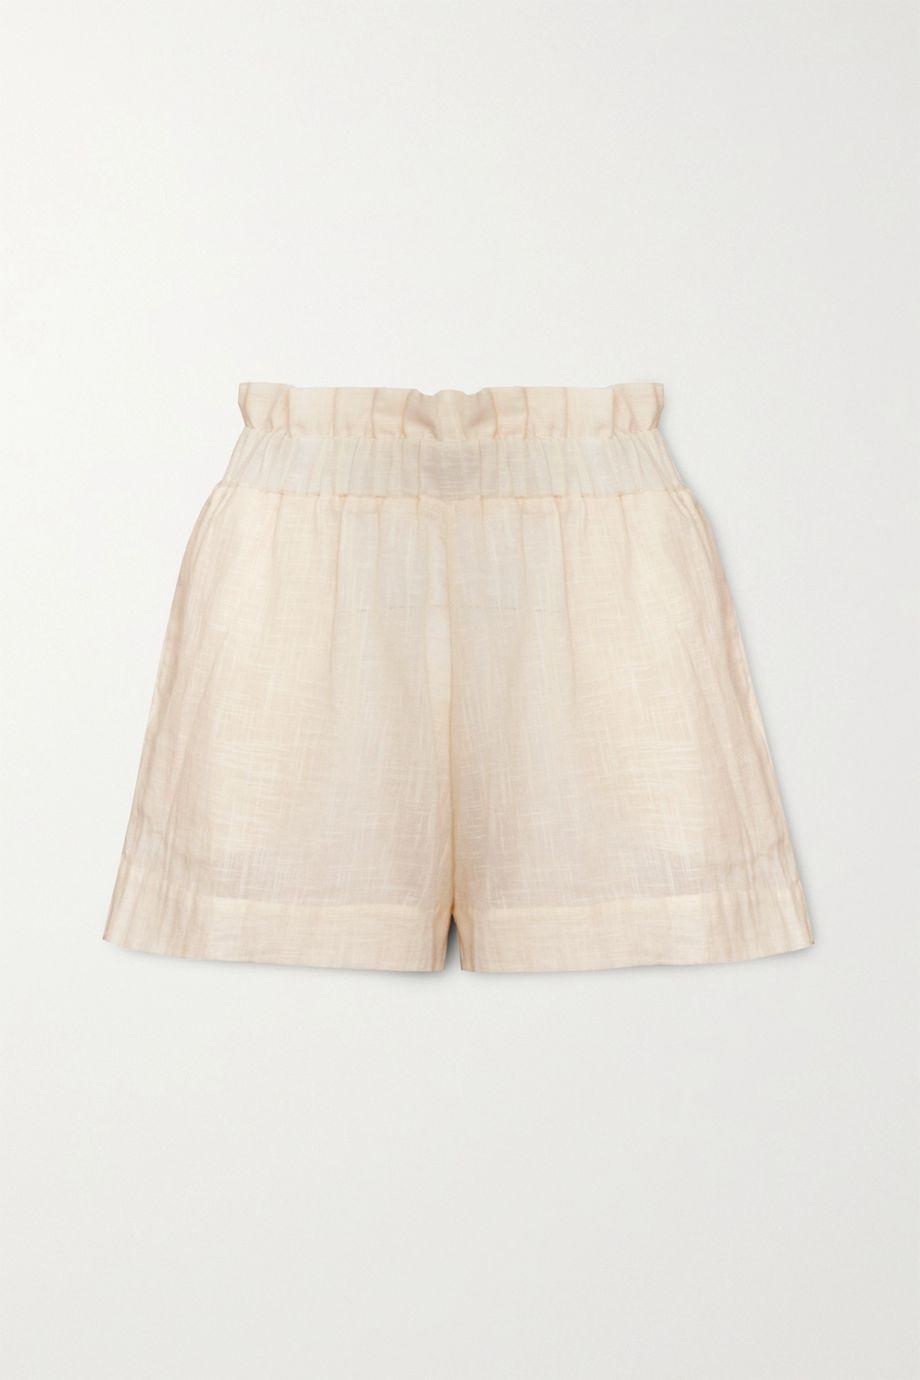 Cloe Cassandro + NET SUSTAIN Jamie organic cotton-gauze shorts